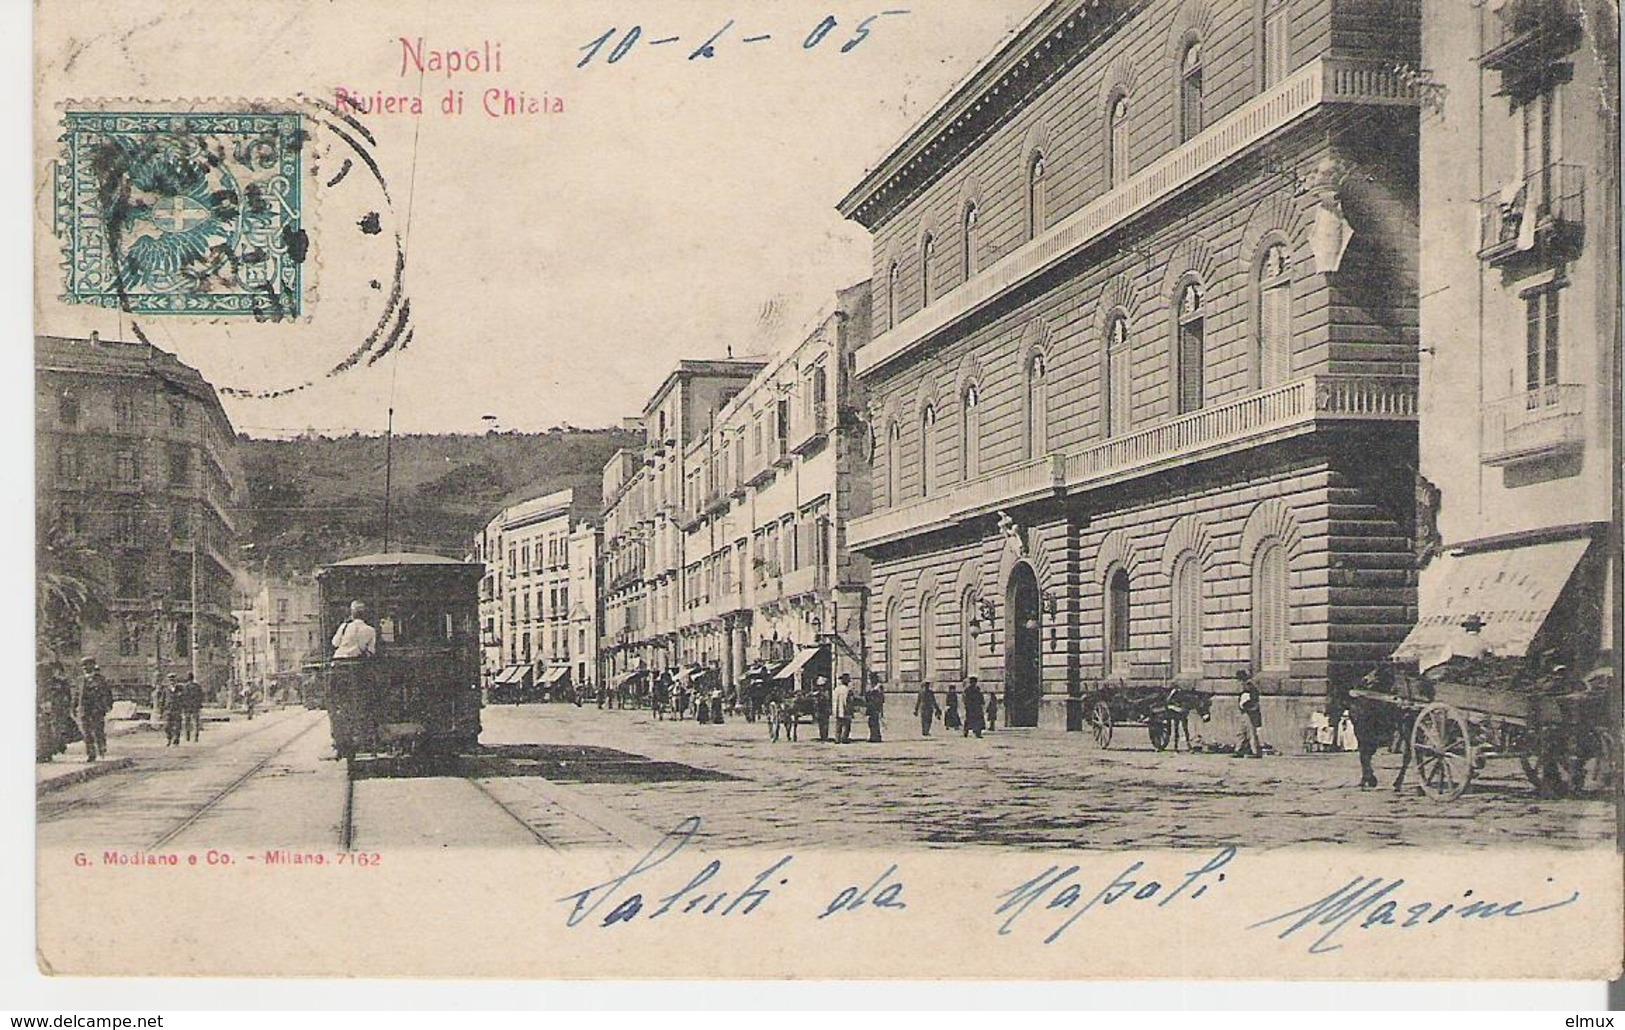 ITALIE - NAPLES - NAPOLI. CPA Voyagée En 1905 Riviera Di Chiaia - Napoli